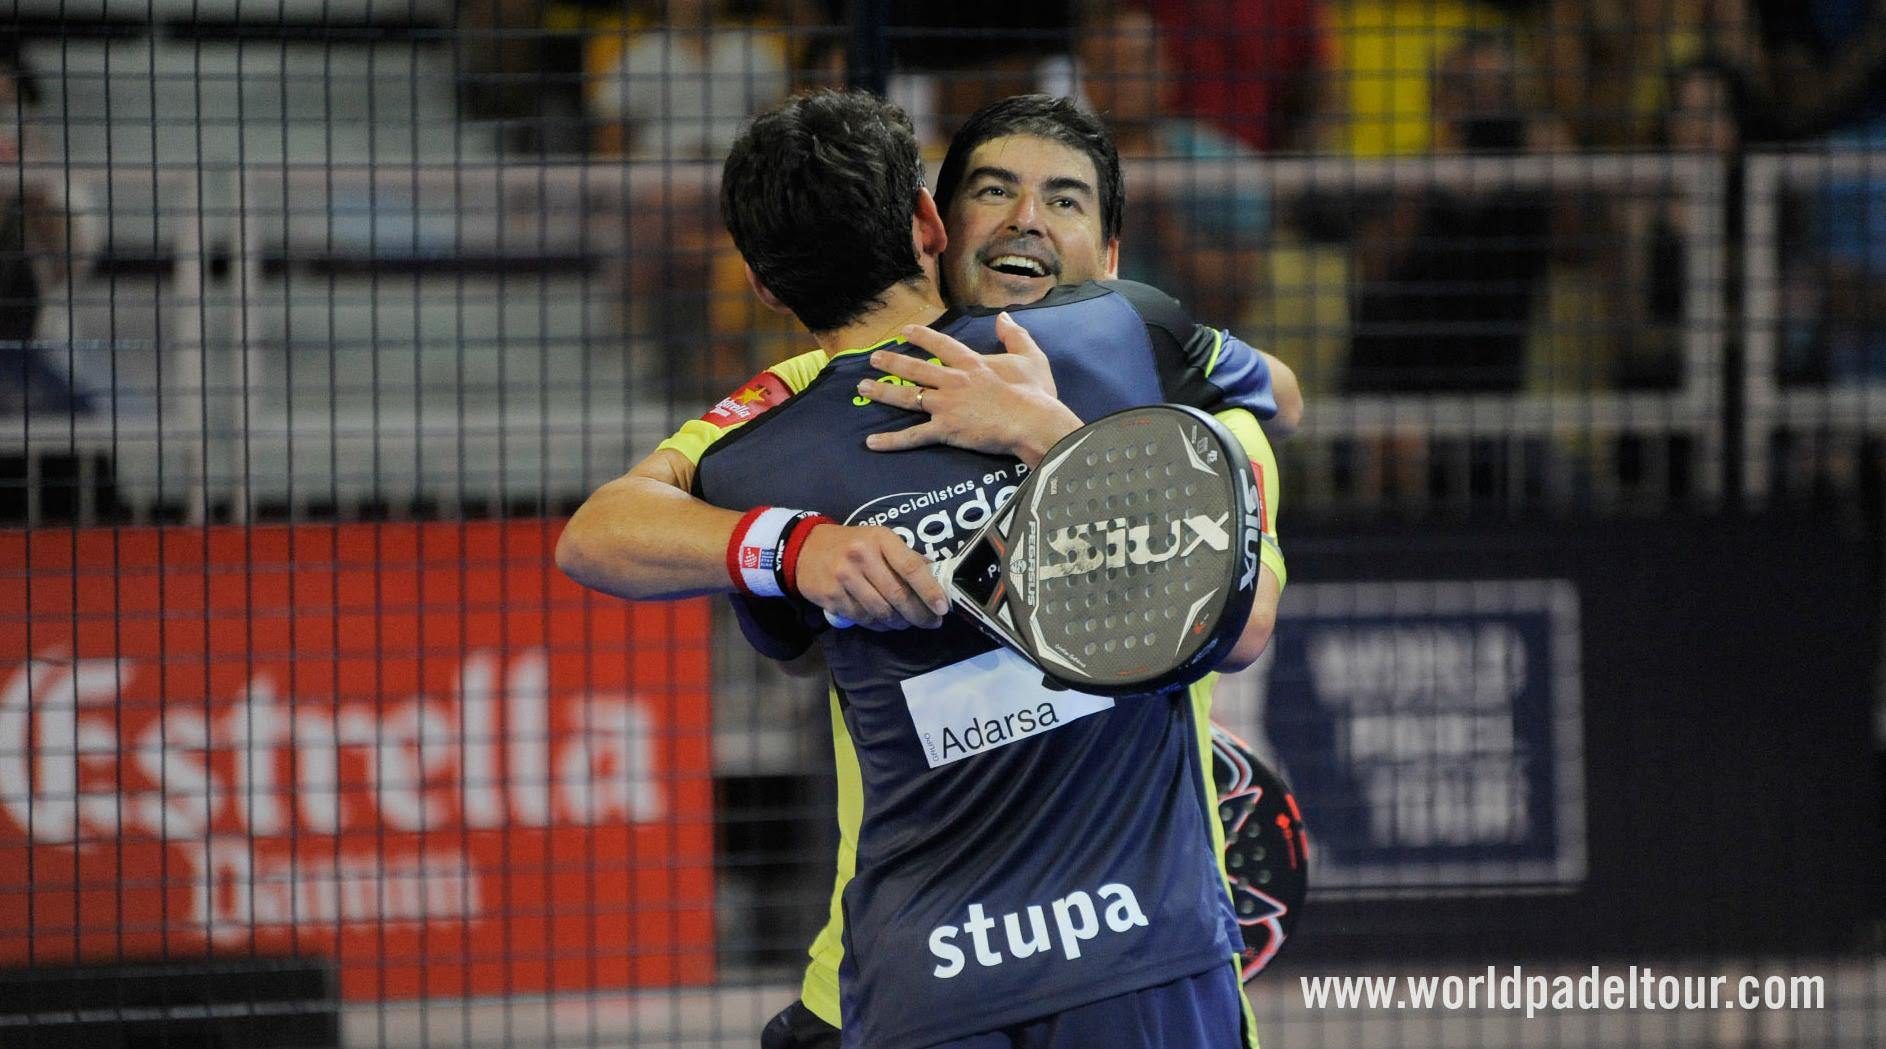 Segunda victoria consecutiva para Stupaczuk y Gutiérrez